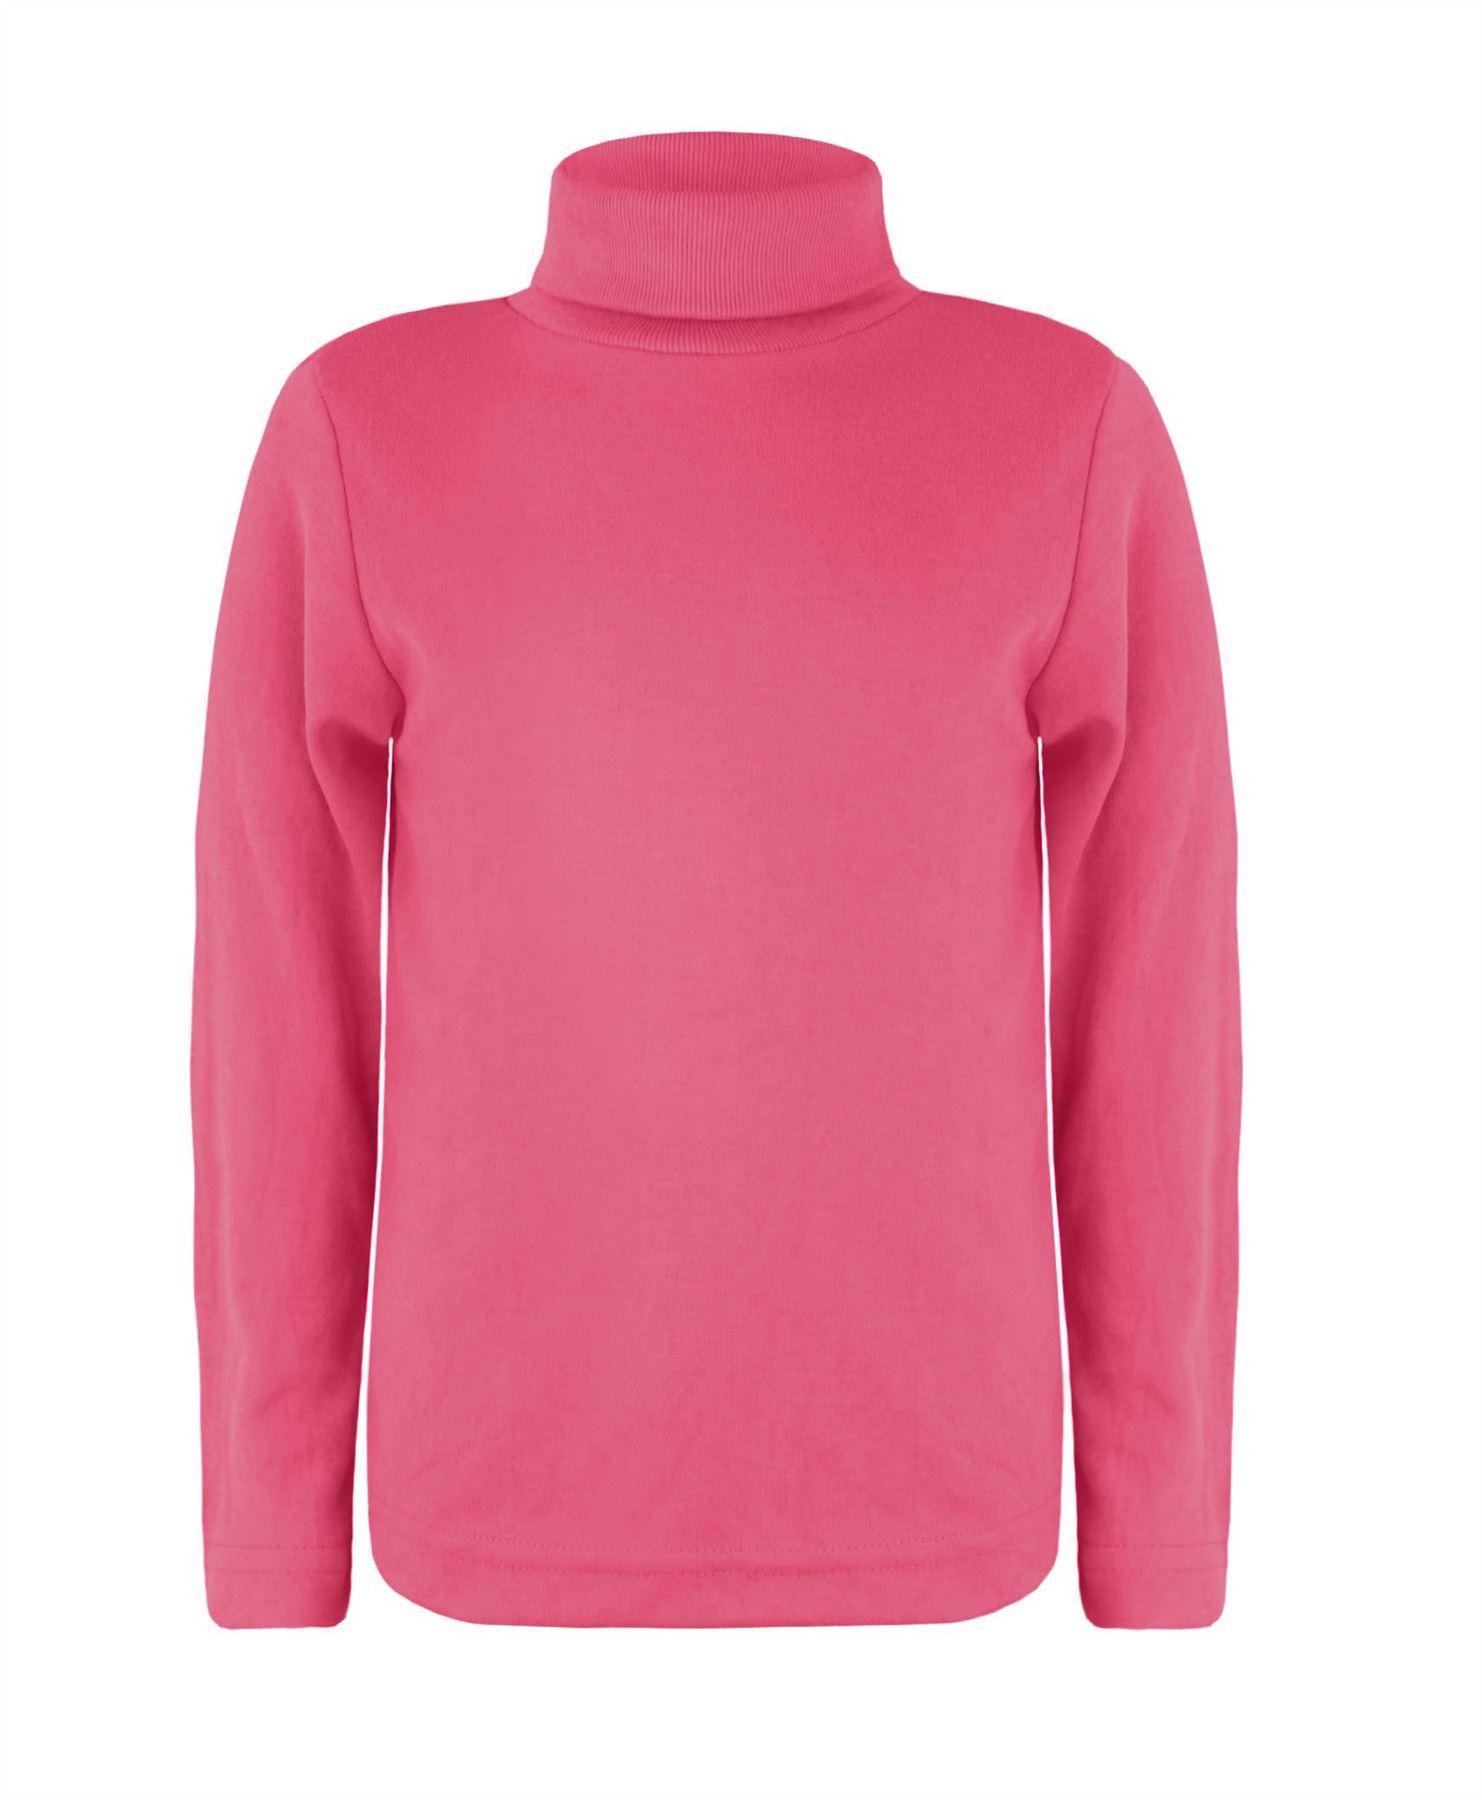 Girls Turtleneck Long Sleeve Plain Basic Top Kids Boys Jersey Polo Tops 2-14 Years